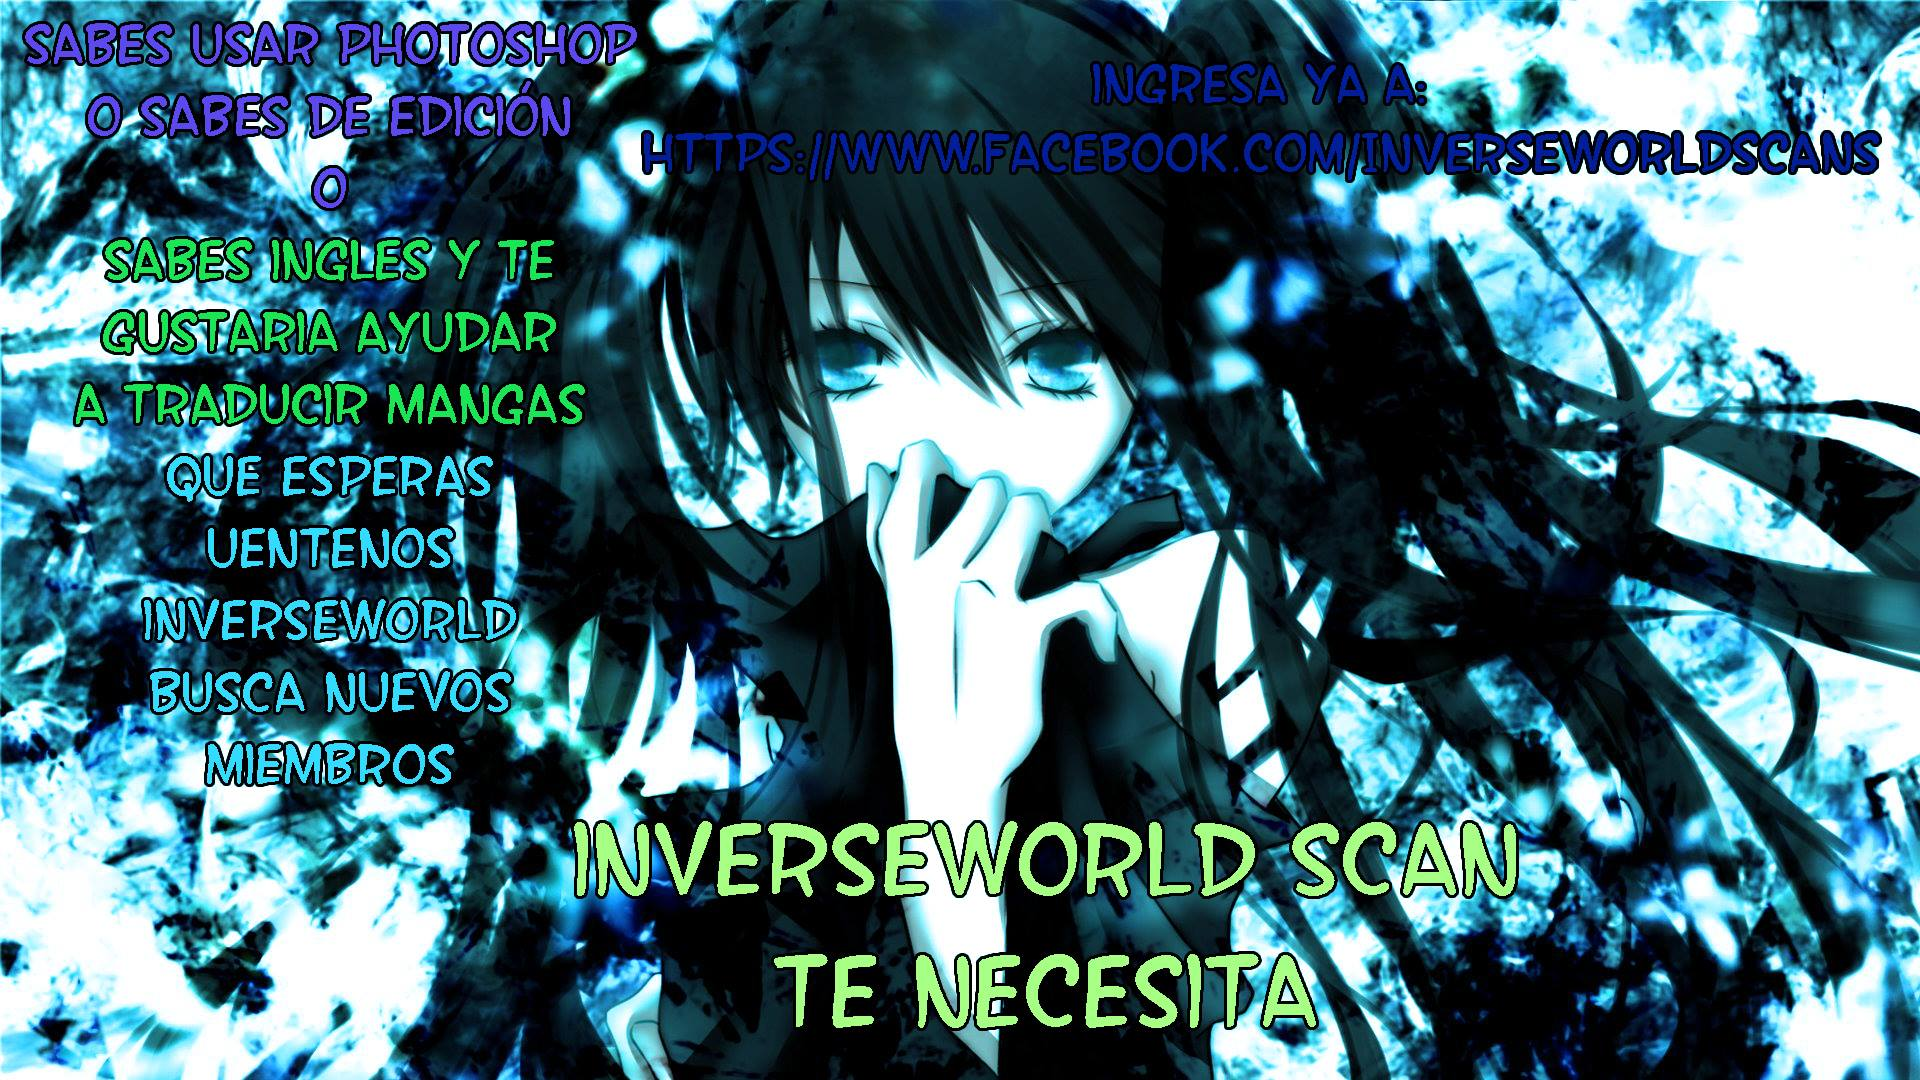 http://c5.ninemanga.com/es_manga/18/16210/415337/84ee449117836706100e5c10b2c8ce38.jpg Page 2